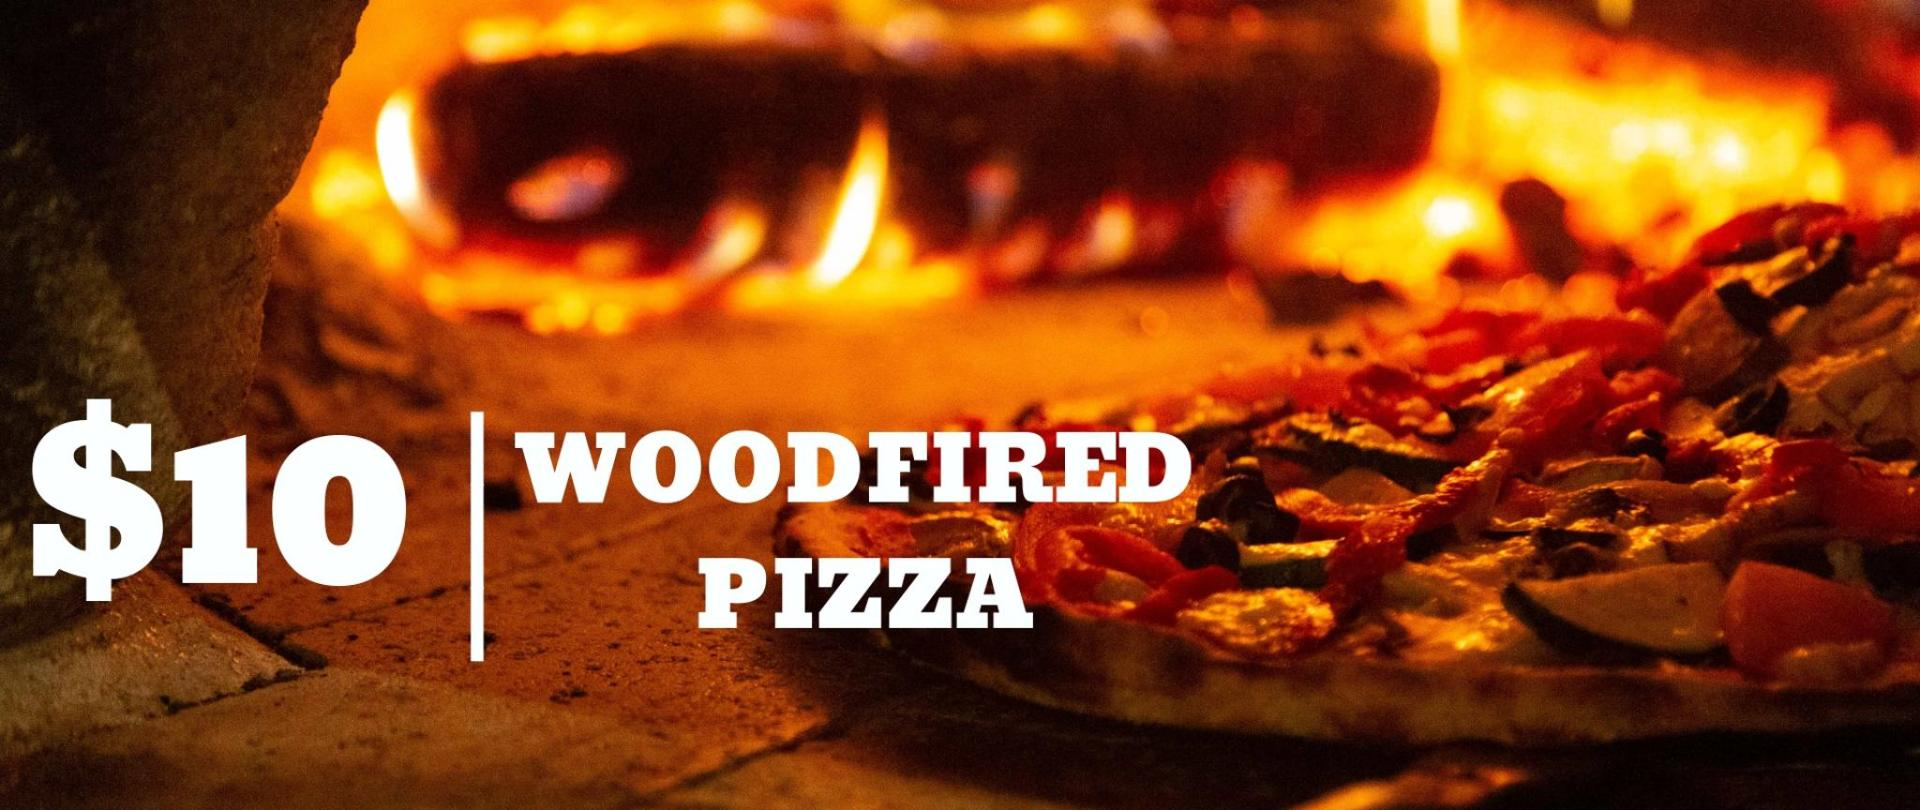 1. Woodfired Pizza.jpg